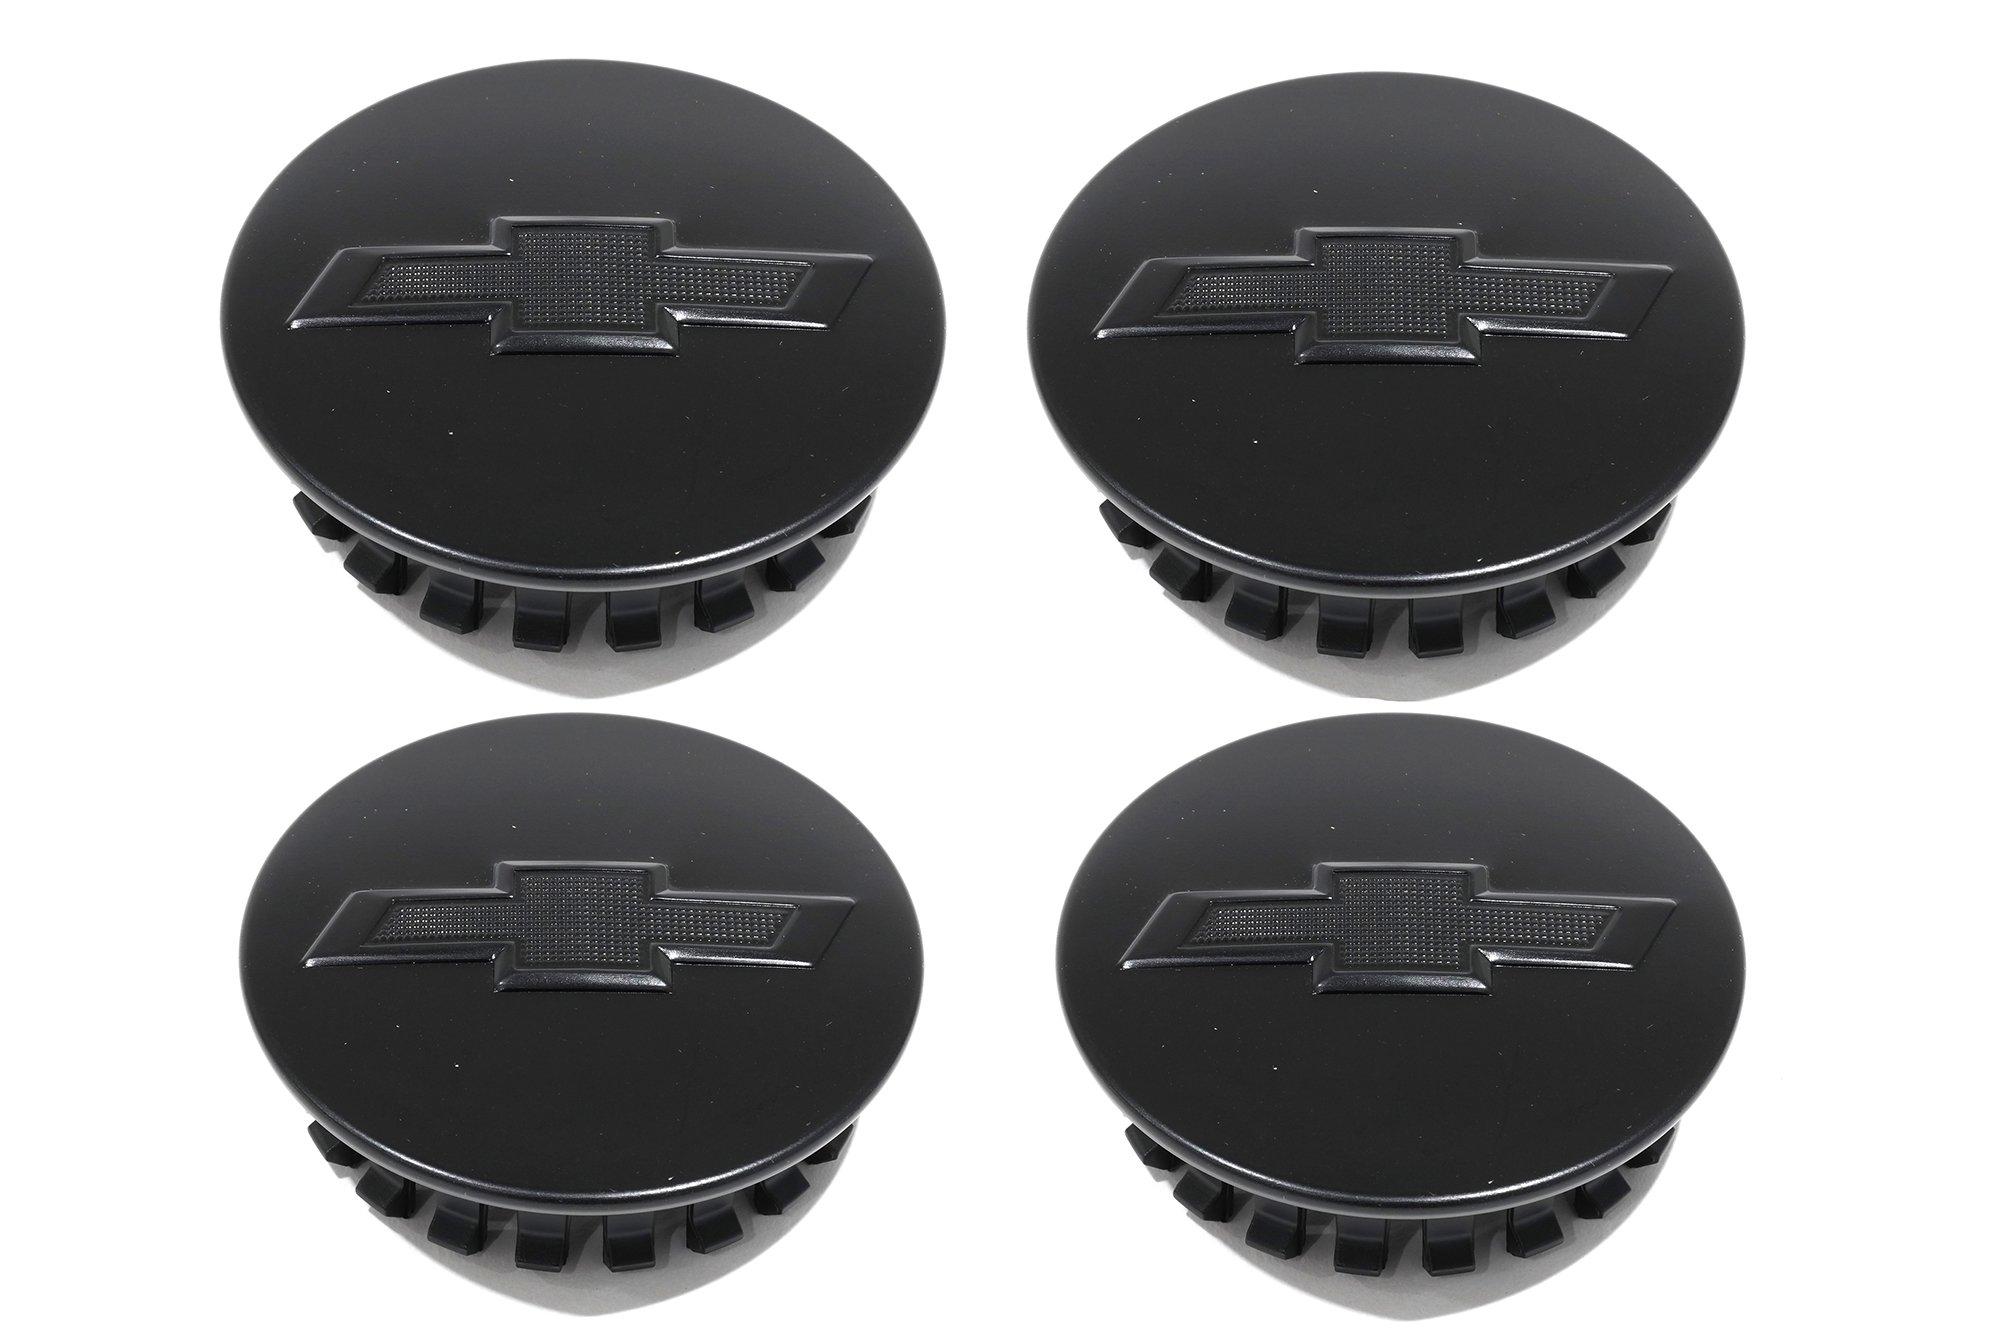 OEM NEW Wheel Center Caps Set of 4 Satin Black w/ Bowtie 16-17 Camaro 23115614